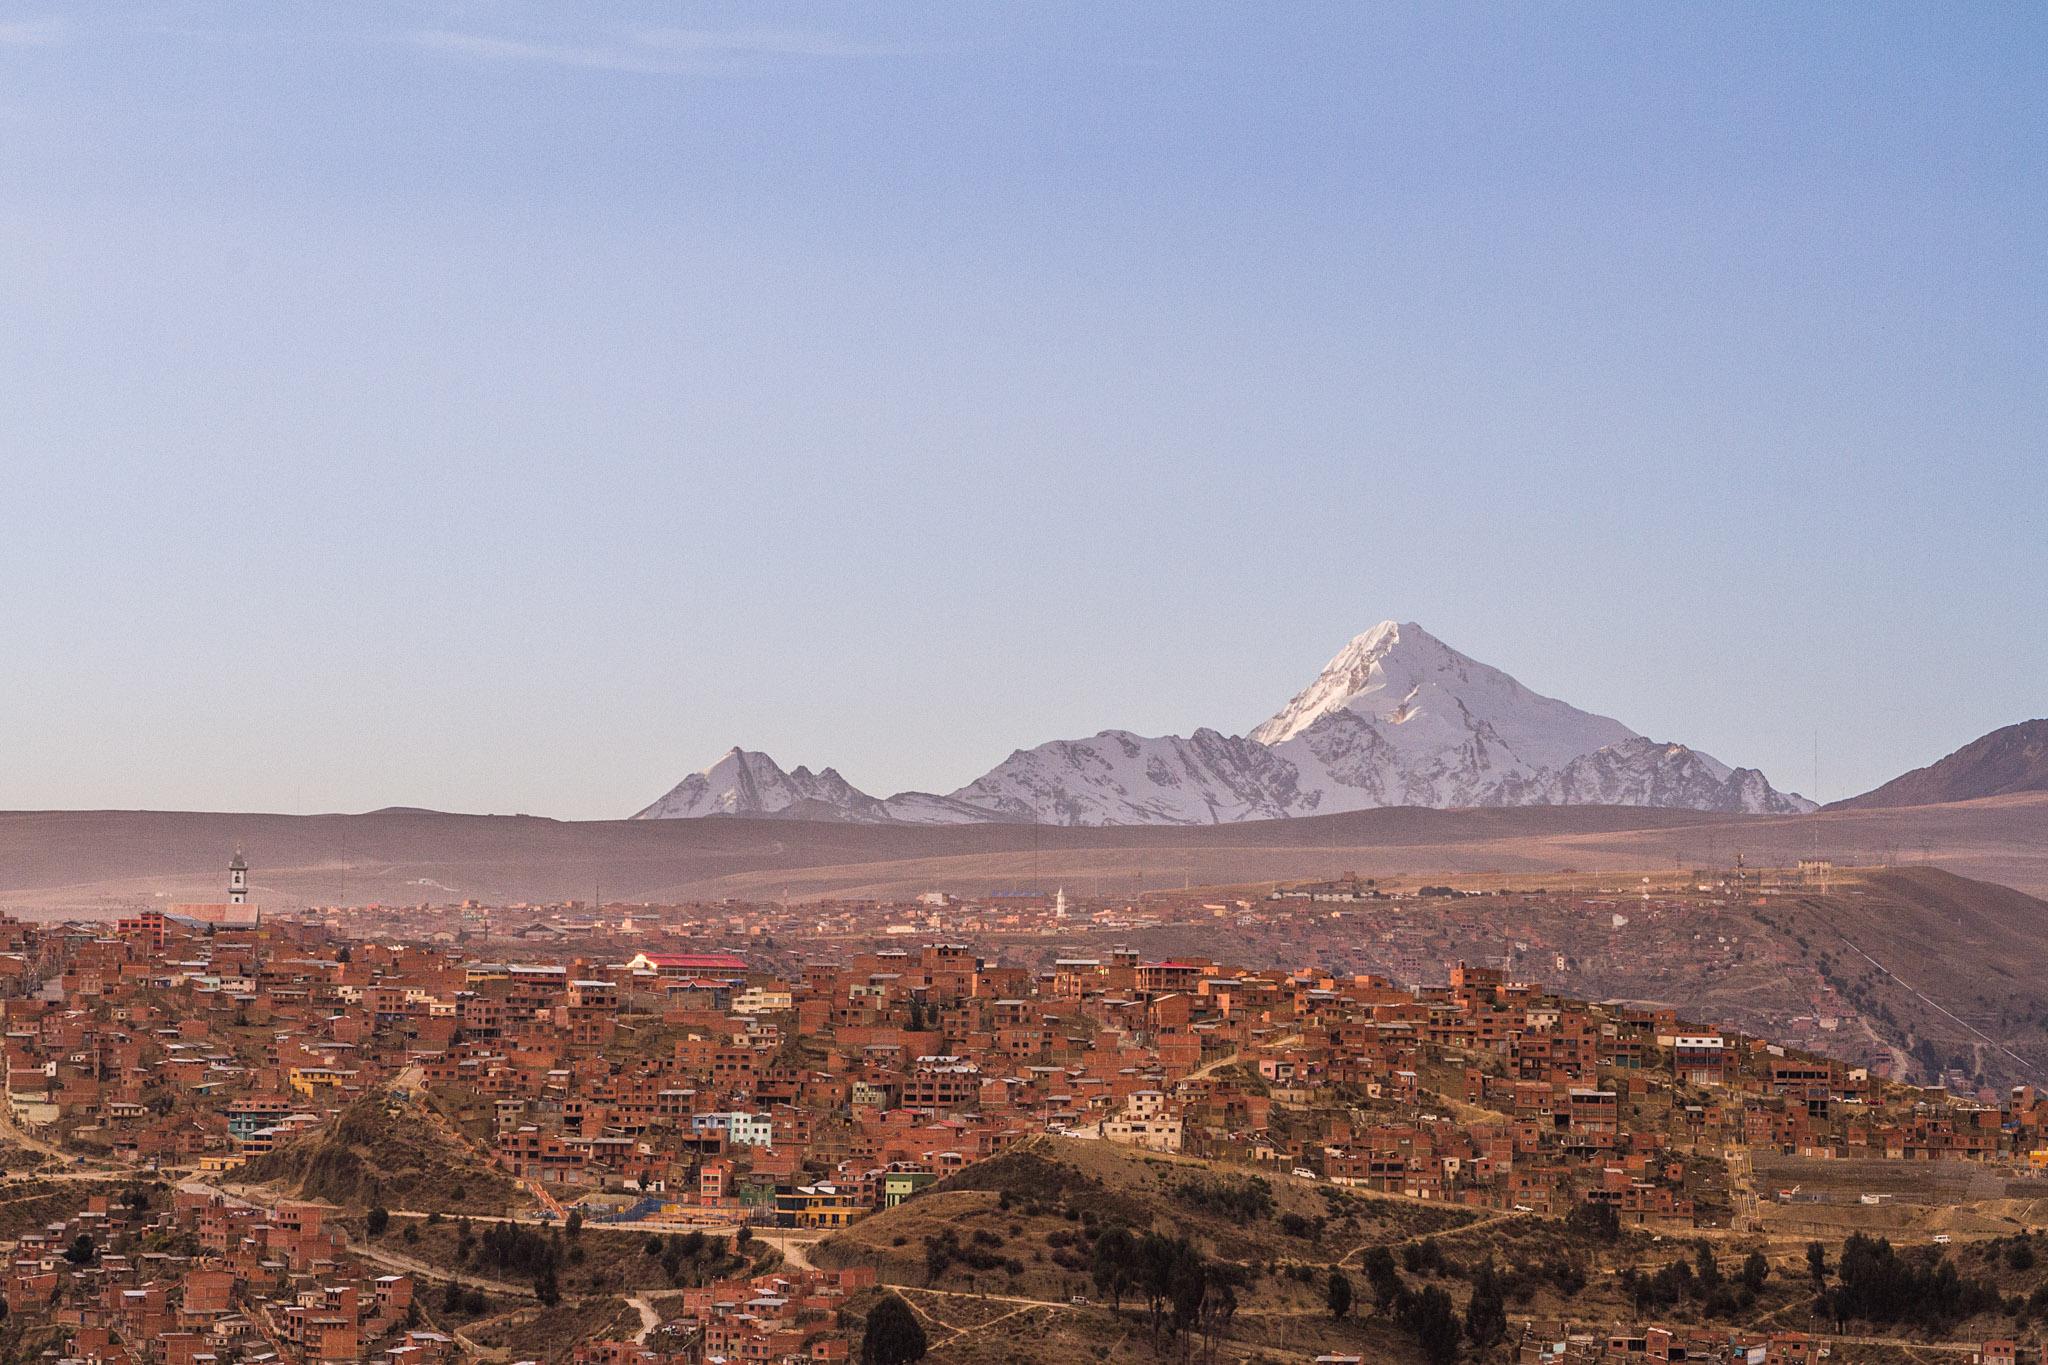 Ali-Barqawi-Studios-Explore-Series-Travel-Adventure-Documentary-C4CGAZA-Bolivia-LaPaz-2015-011.jpg